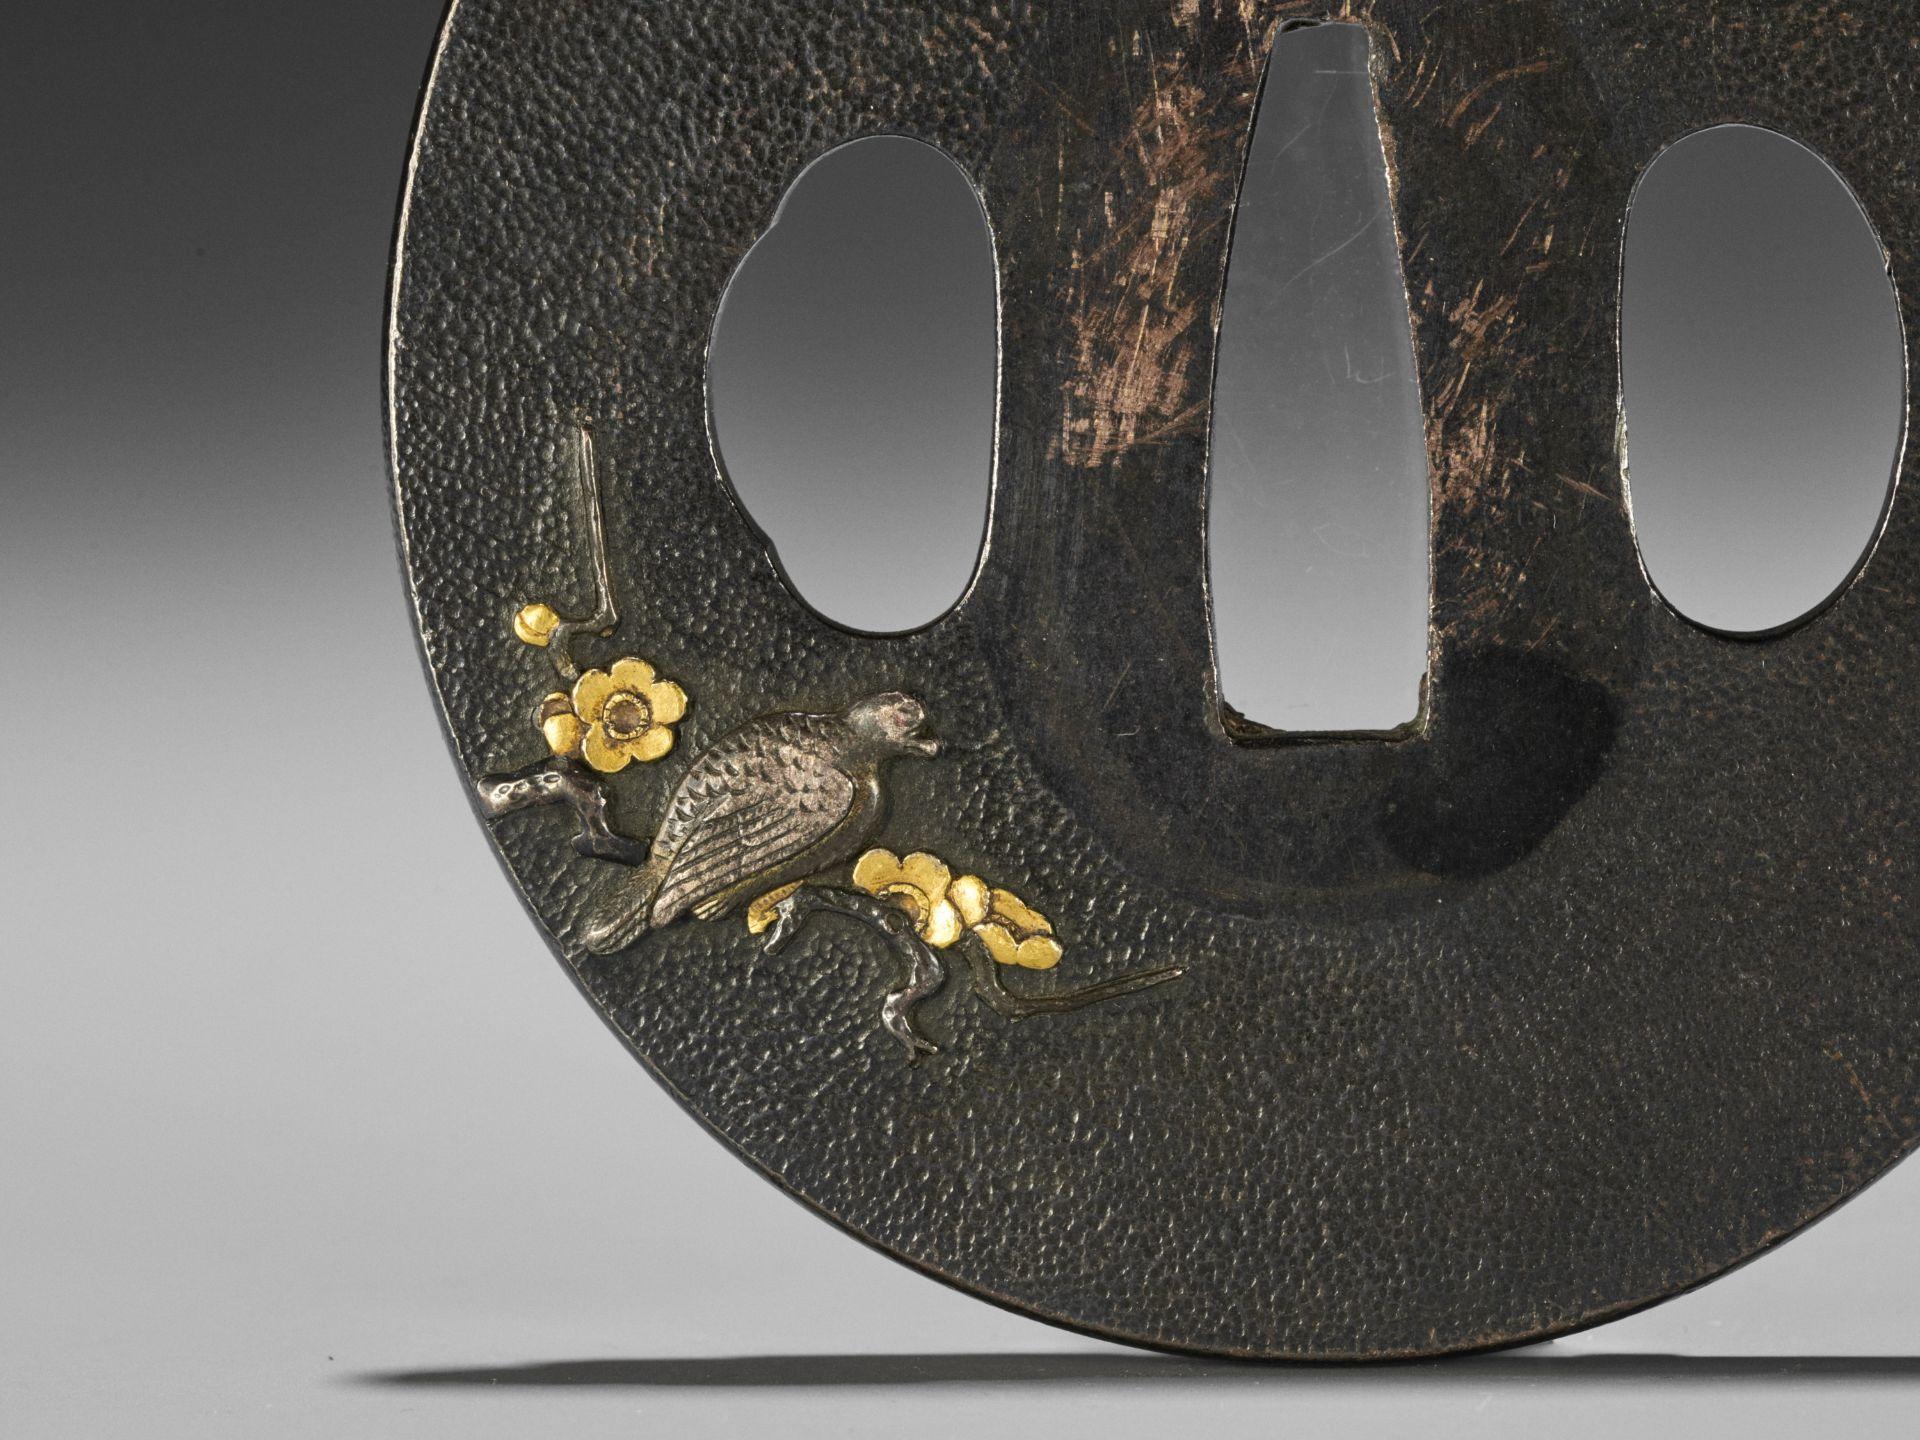 A SHIBUICHI AND GOLD TSUBA - Image 4 of 4